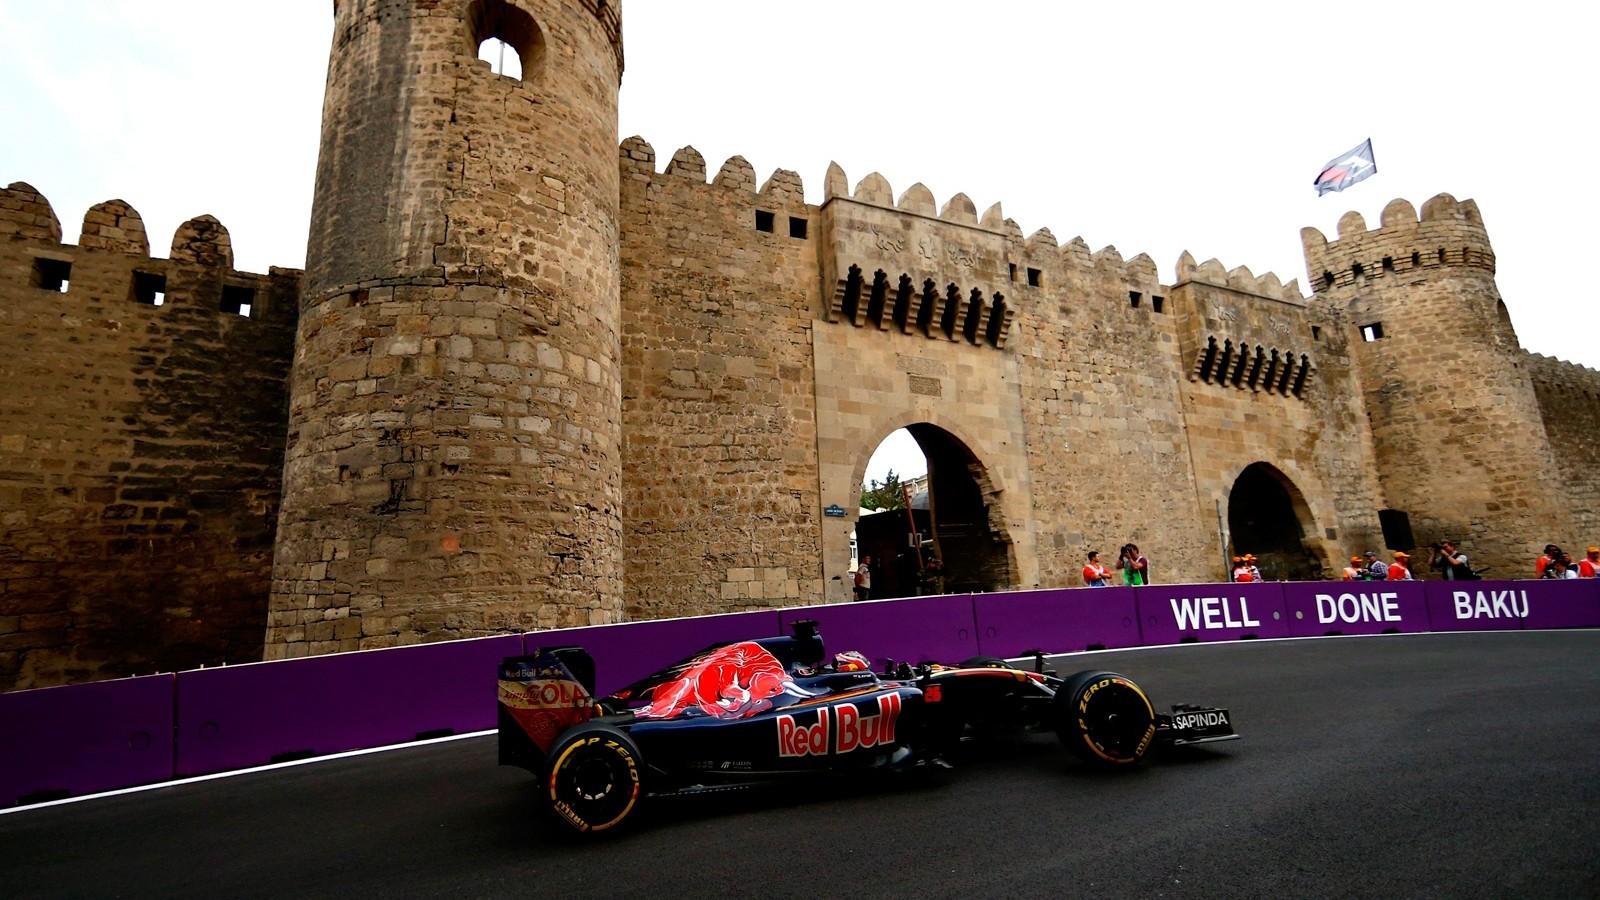 В Баку команда Toro Rosso не смогла набрать очки из-за двойного схода